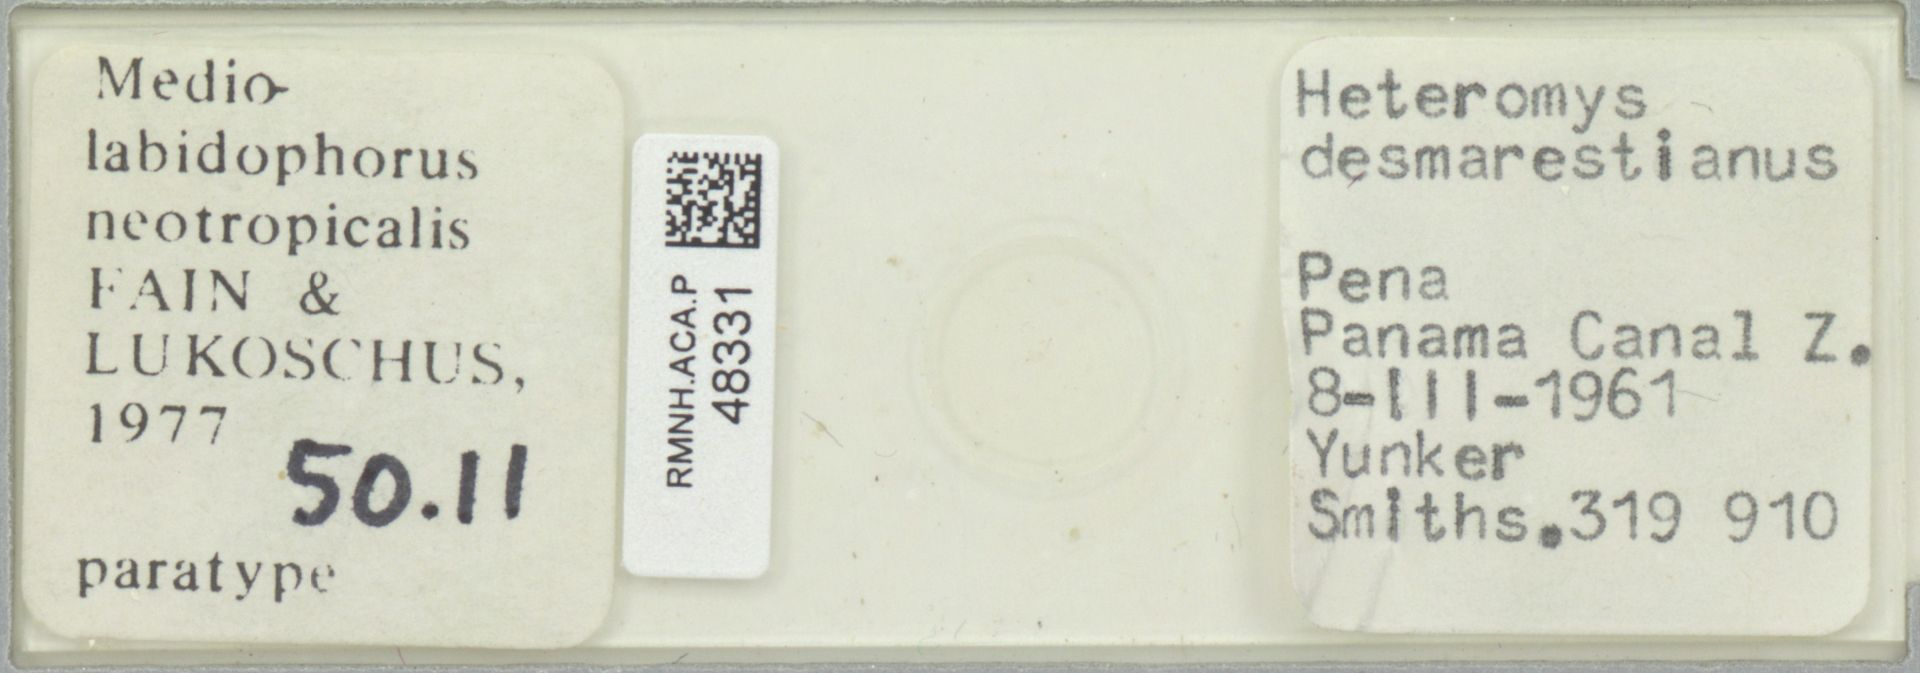 RMNH.ACA.P.48331 | Mediolabidophorus neotropicalis Fain & Lukoschus 1977